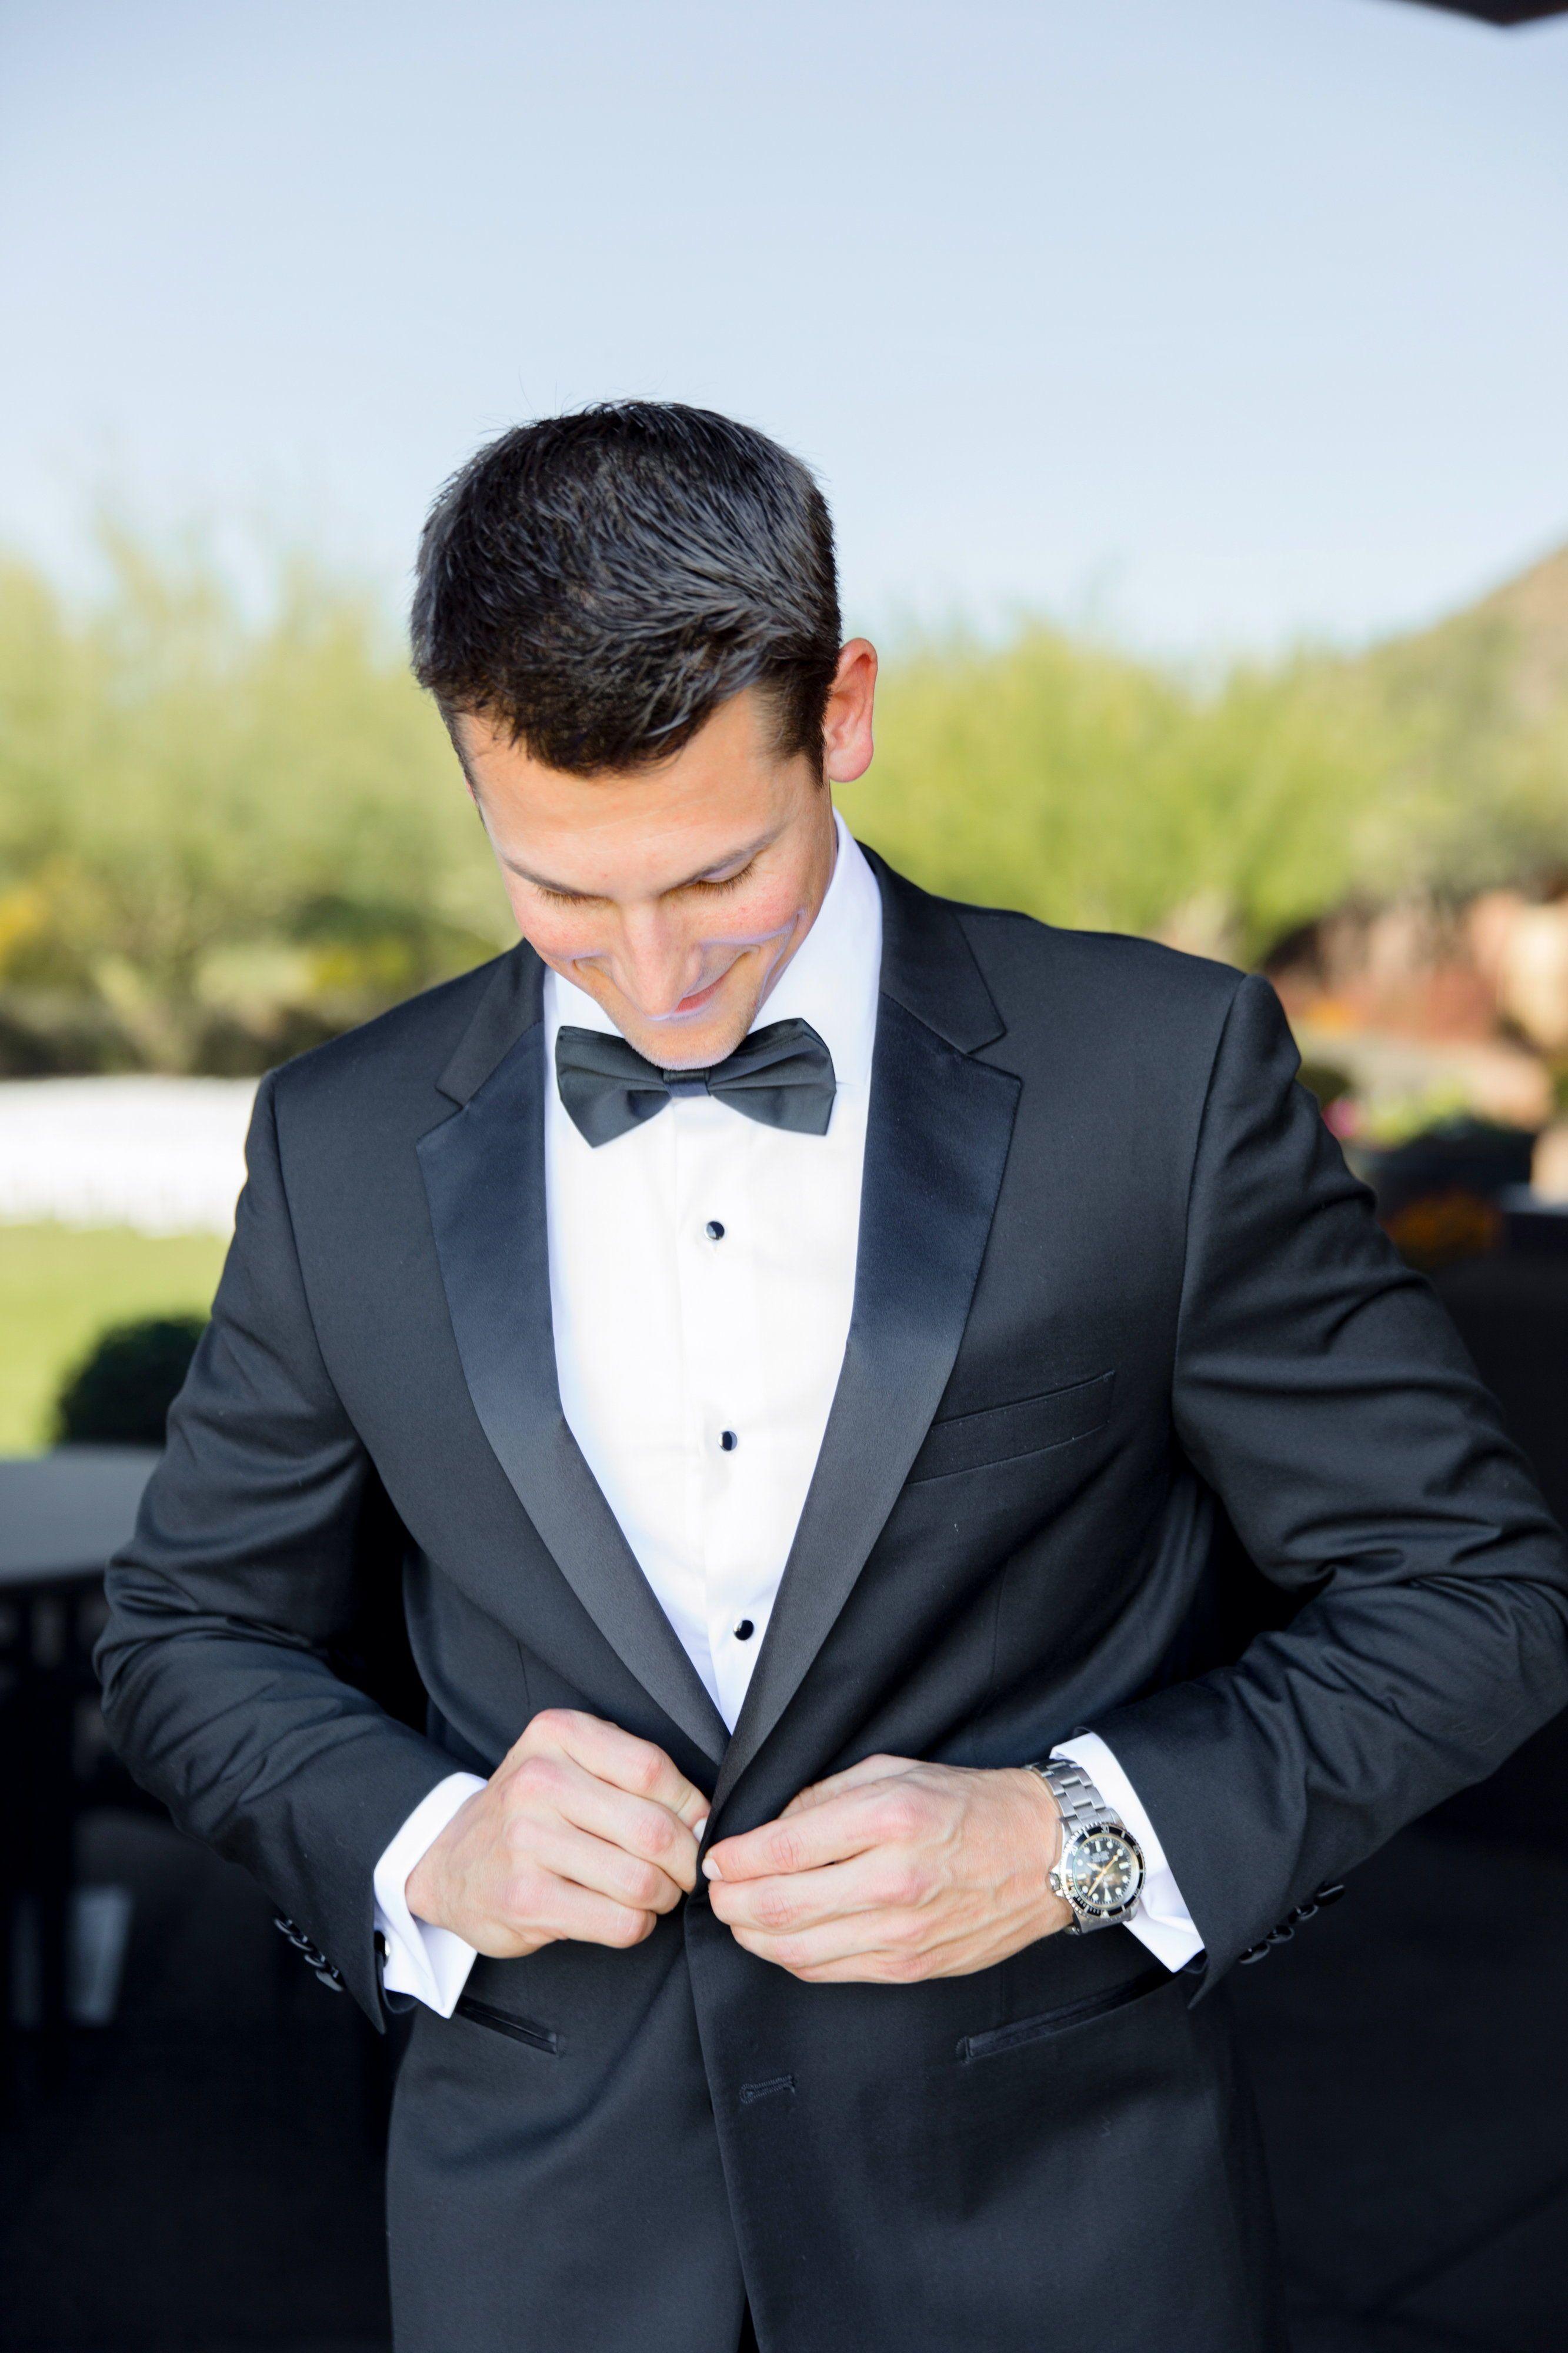 Notch Lapel Tuxedo Groom Suit Black Tuxedo Jacket Black Suit Wedding [ 4000 x 2666 Pixel ]